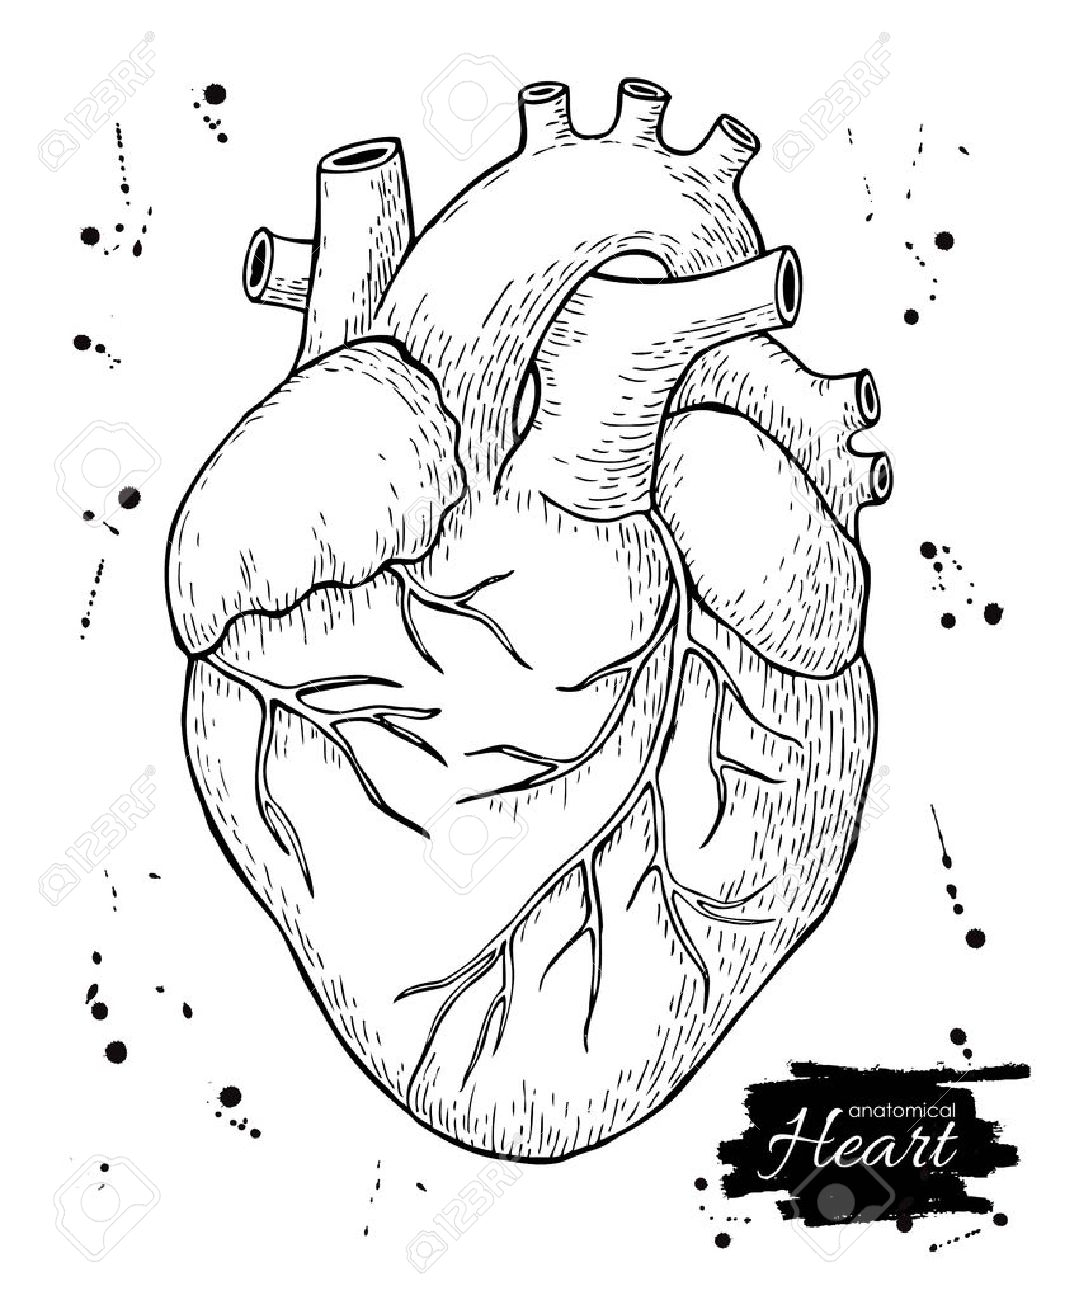 Anatomical Drawing Heart at GetDrawings   Free download